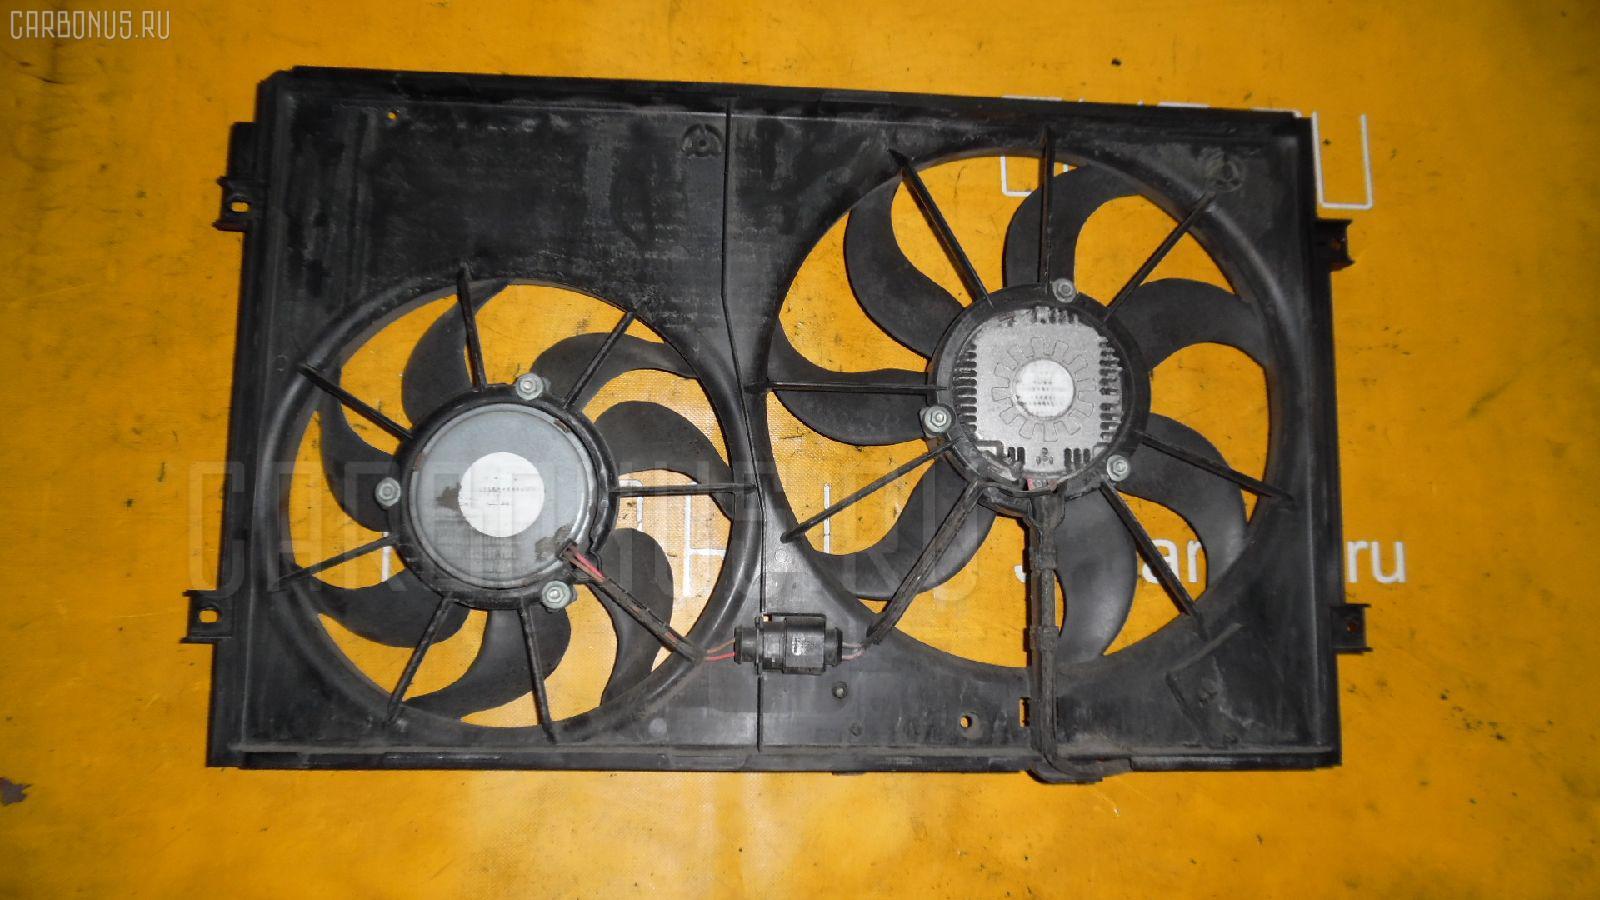 Вентилятор радиатора ДВС AUDI A3 SPORTBACK 8PBLR BLR. Фото 2